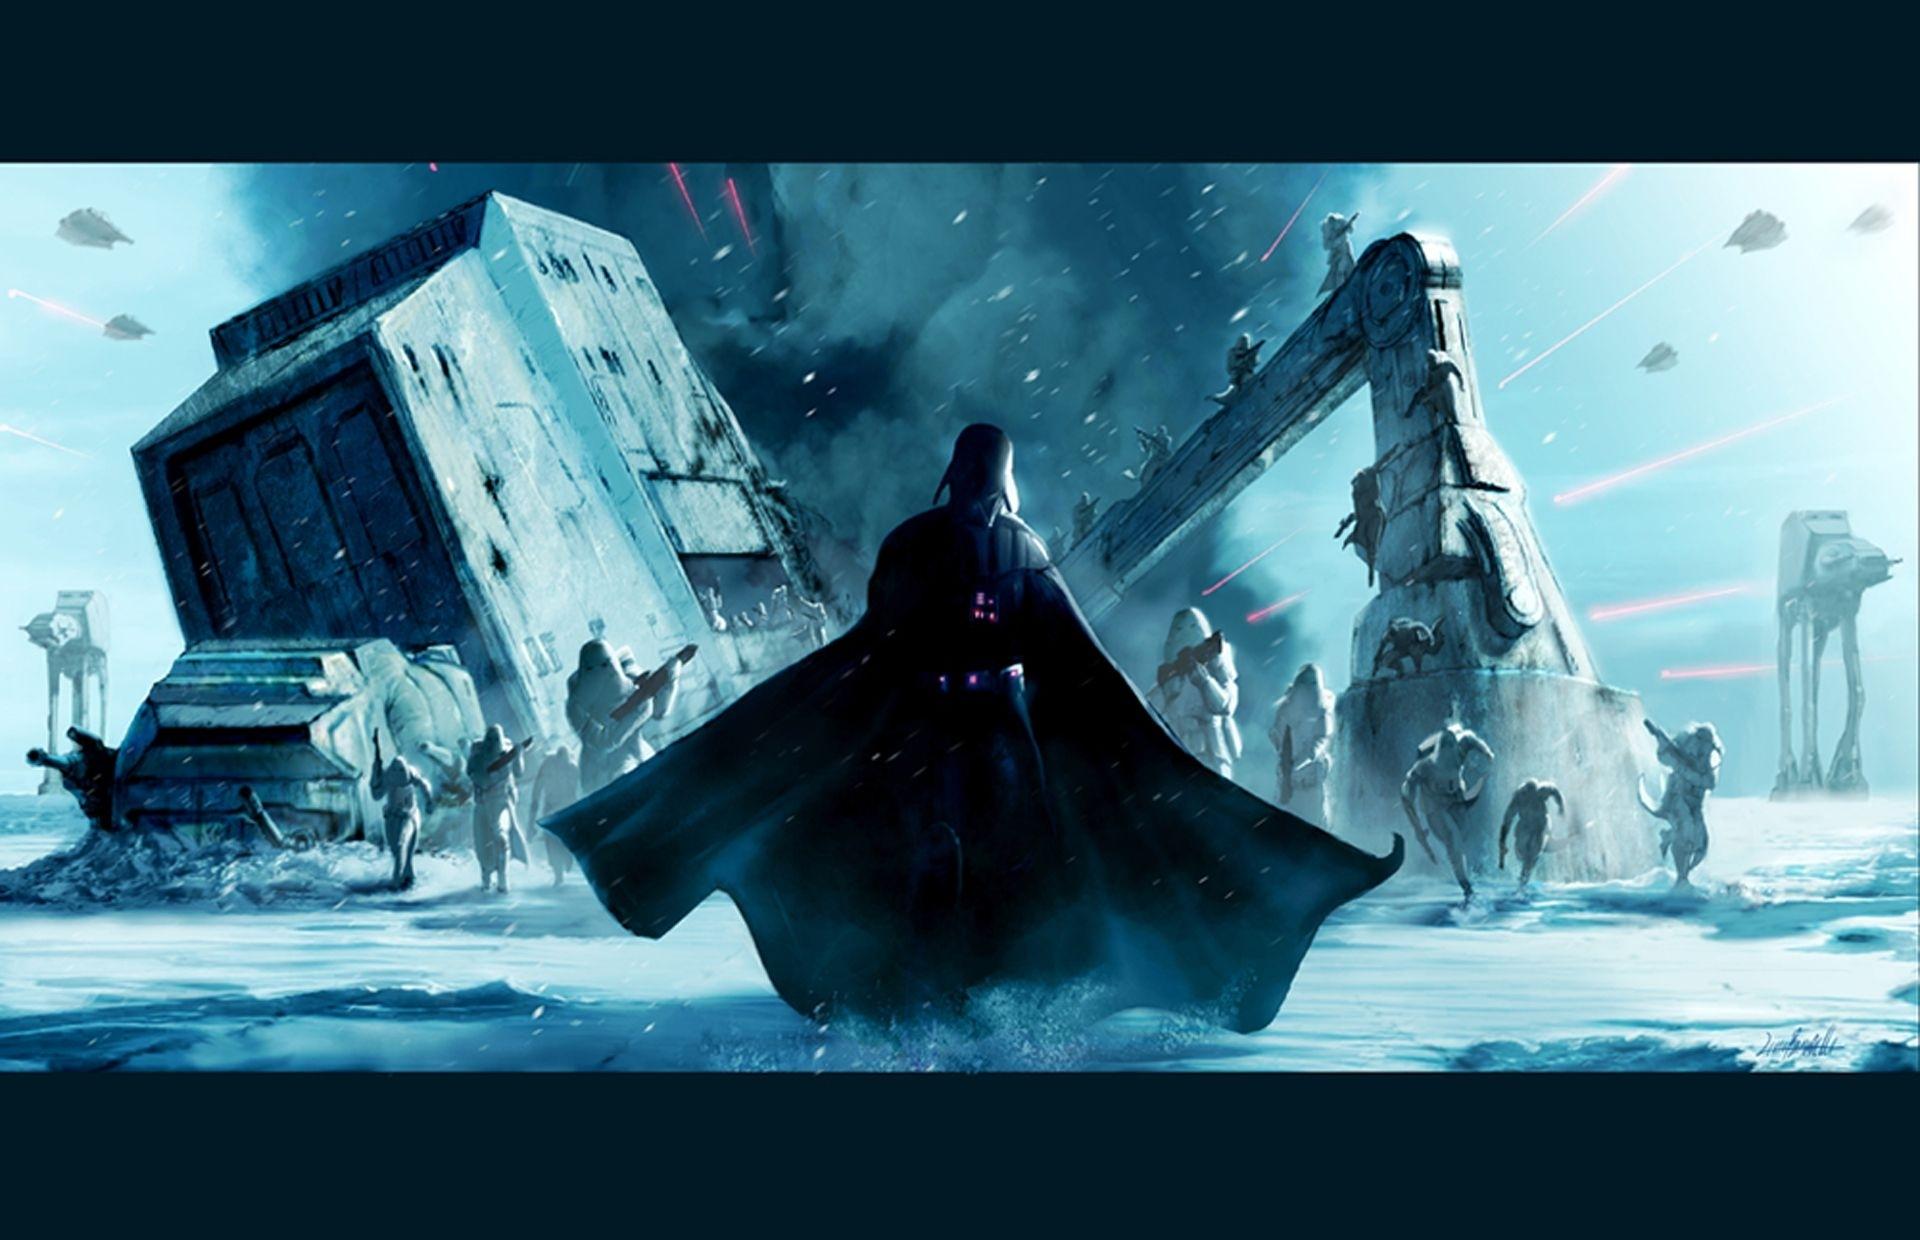 el imperio contra ataca | star wars | pinterest | star, starwars and